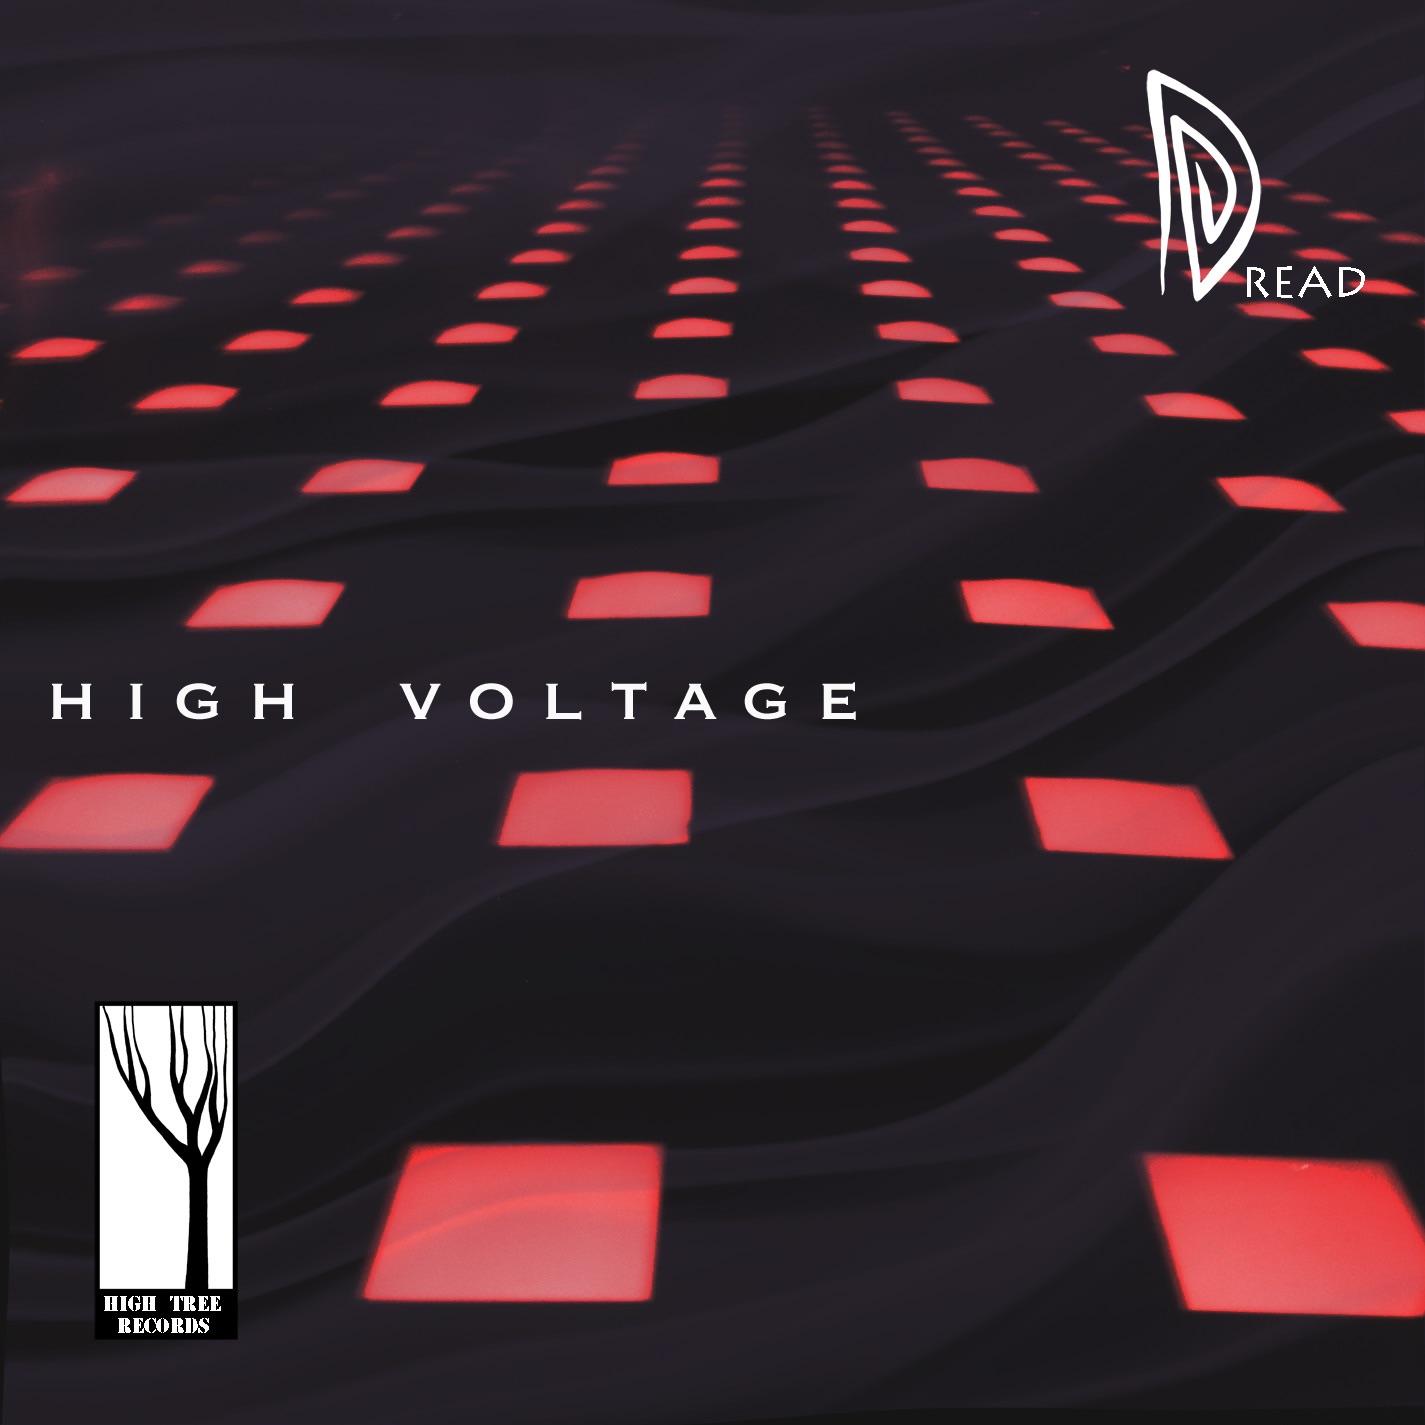 High Voltage - Single